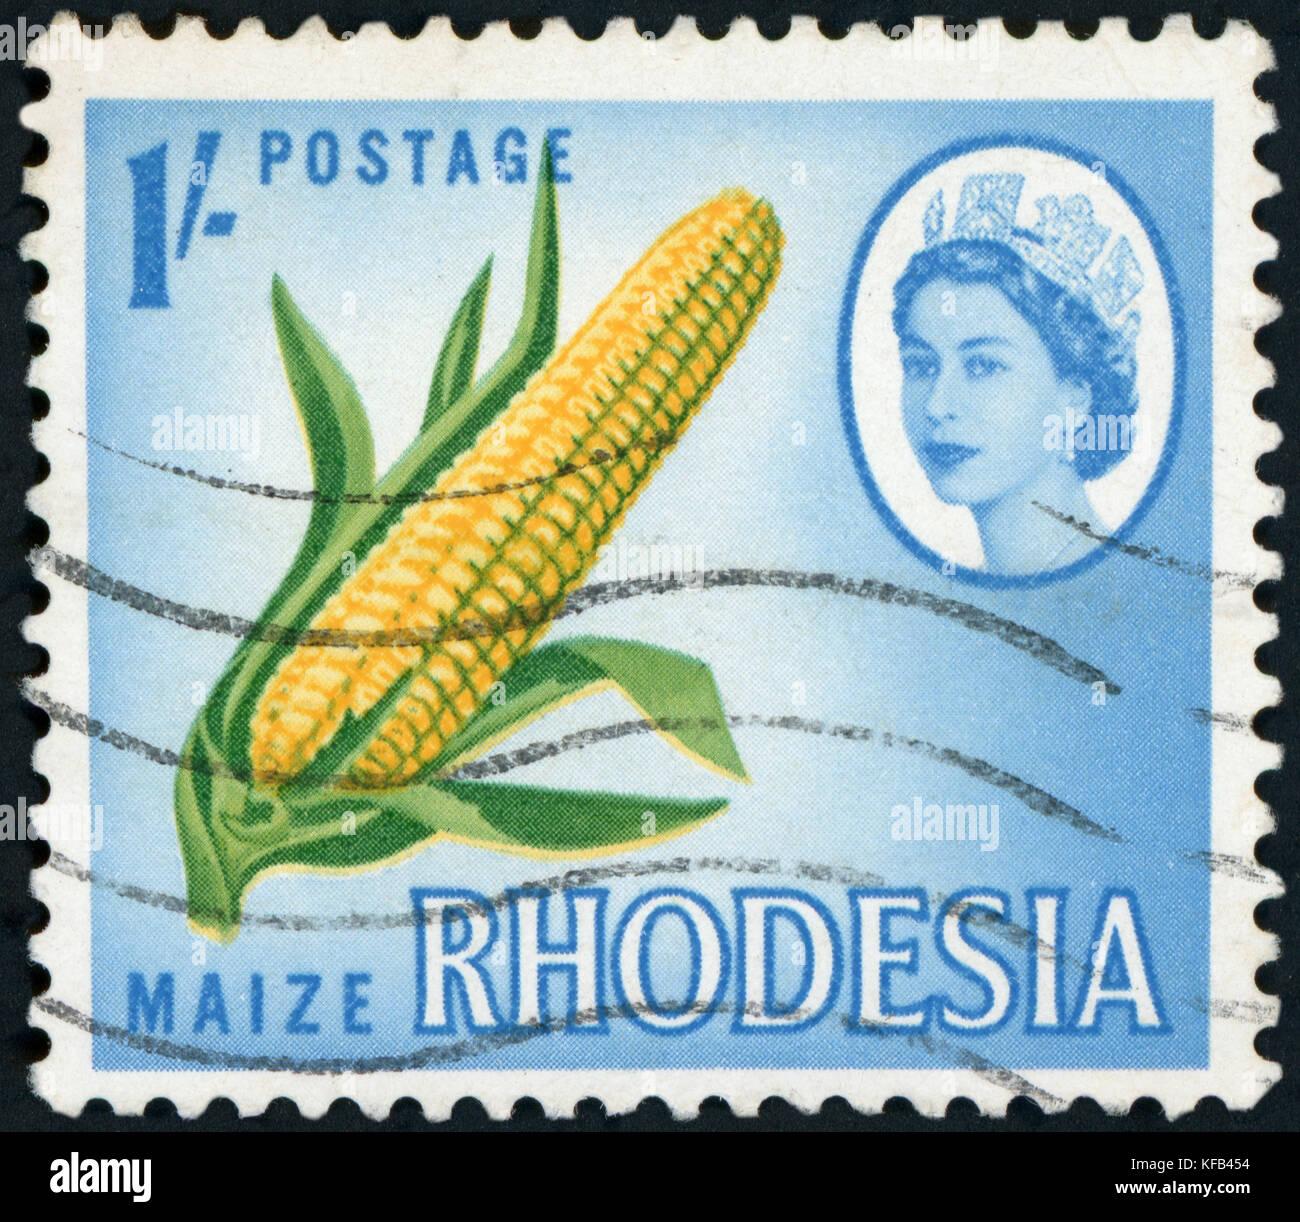 Postage Stamp - Rhodesia - Stock Image